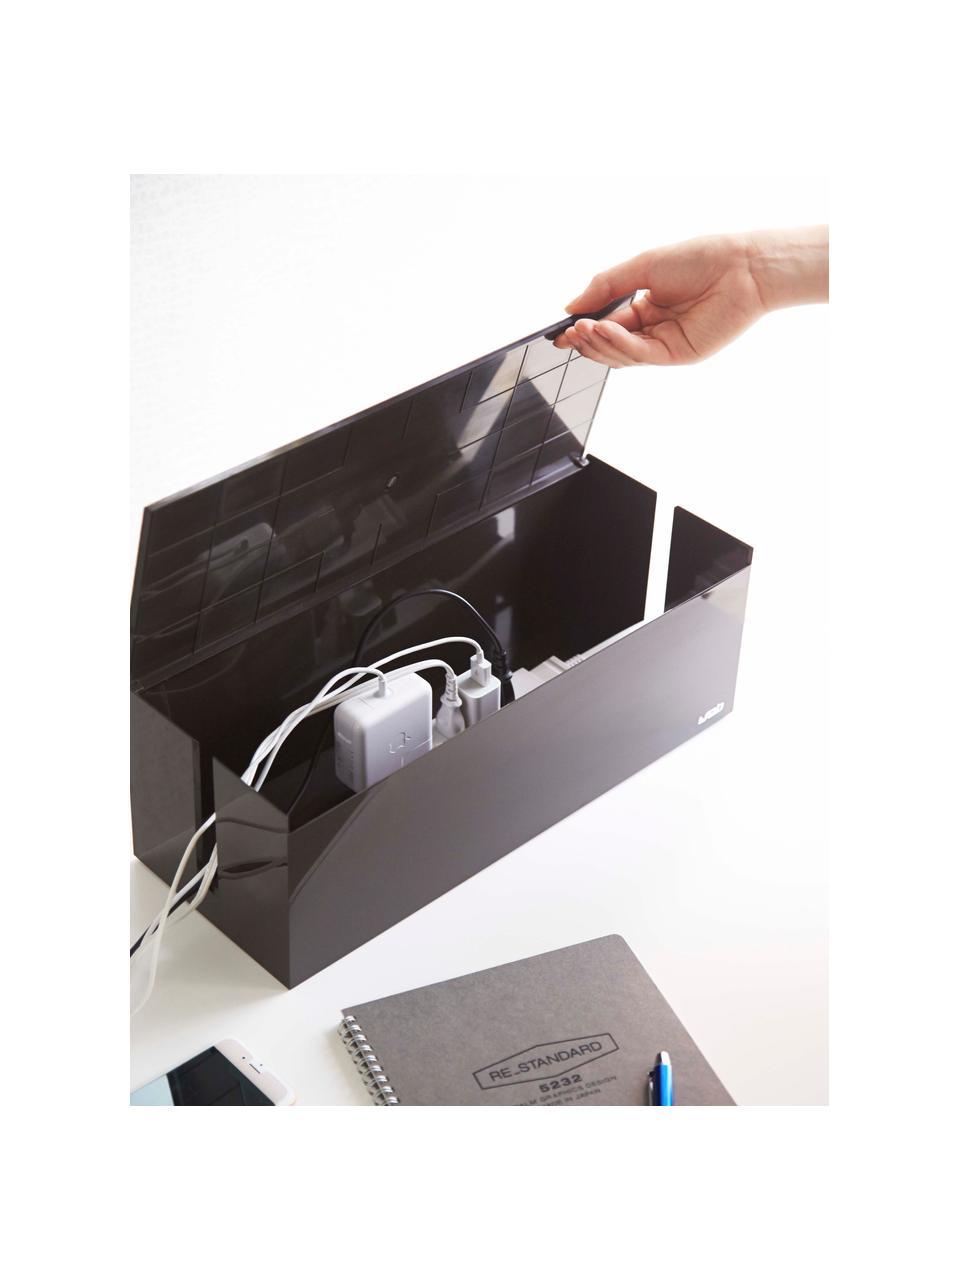 Scatola per cavi Web, Materiale sintetico (policarbonato), poliresina, Marrone, Larg. 40 x Alt. 15 cm